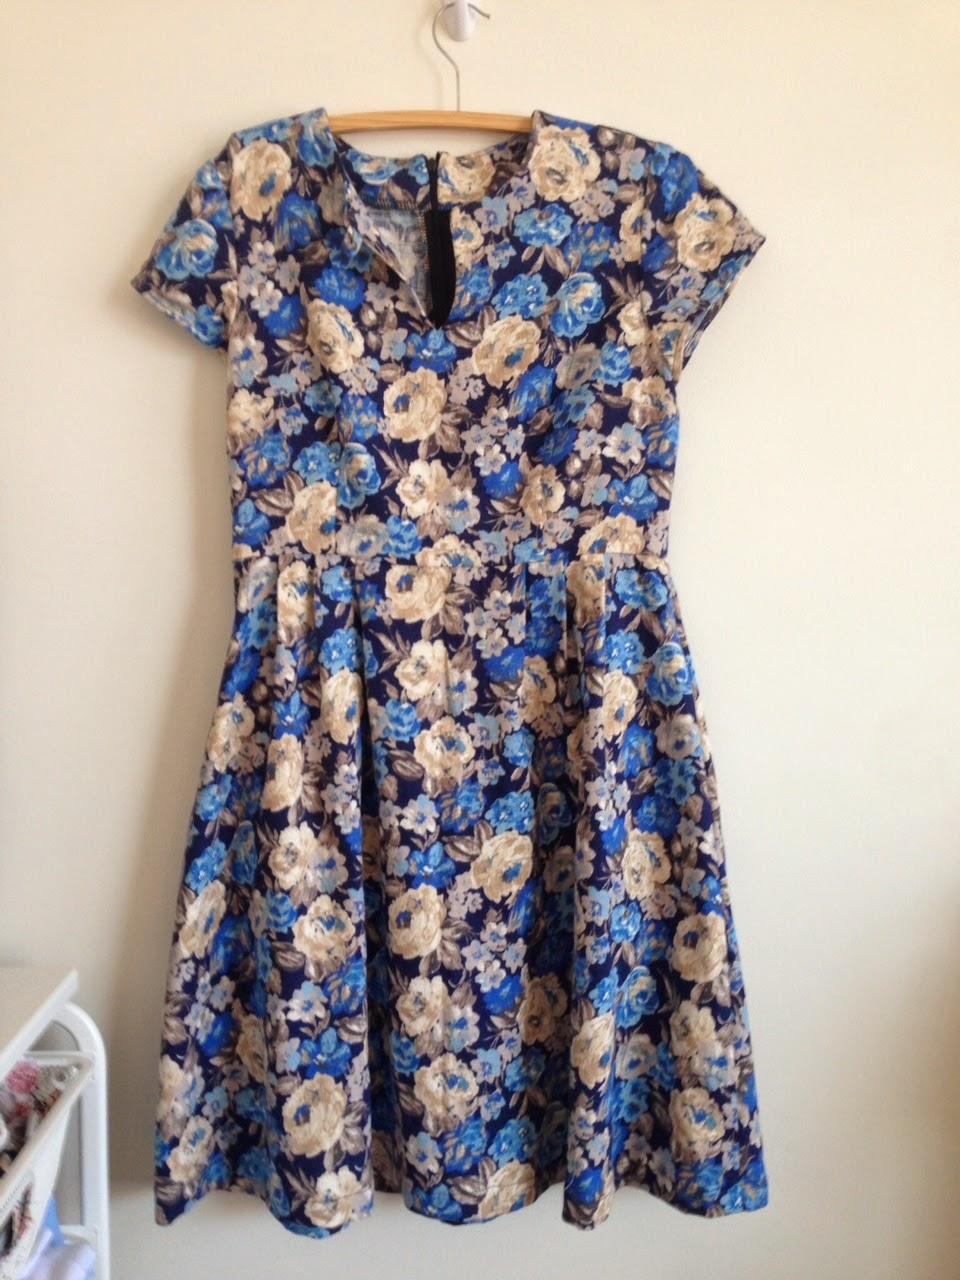 Simplicity 1419 Round Trip Dress